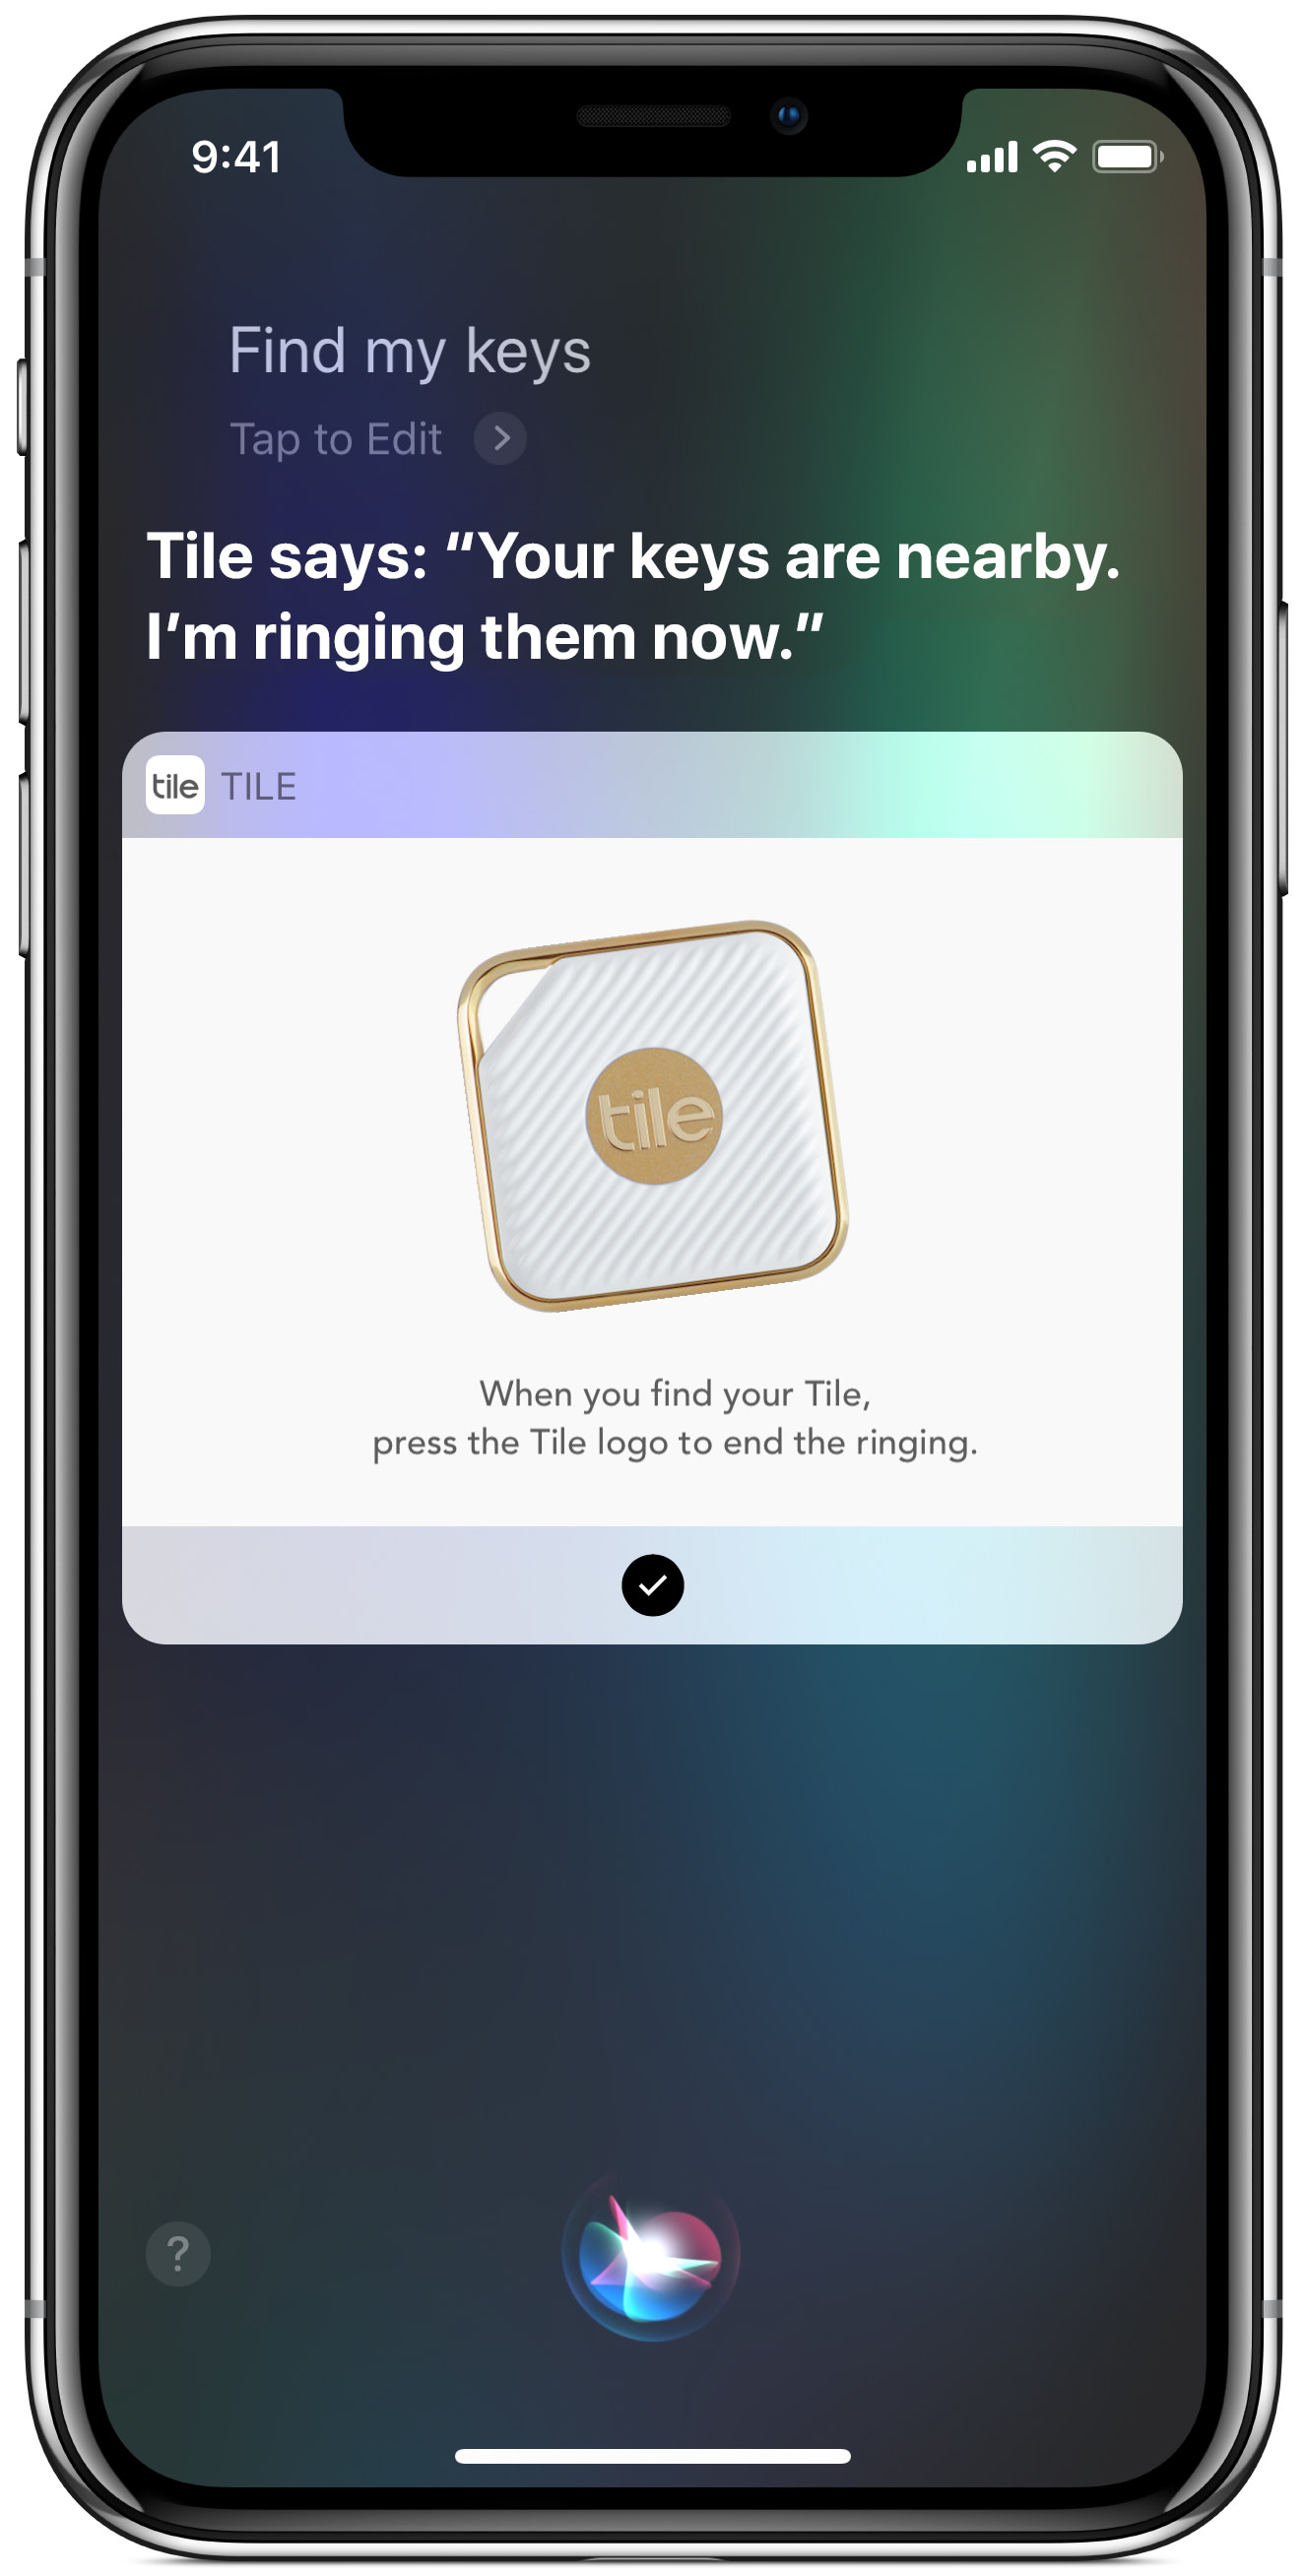 Tile In Siri 180912 102904